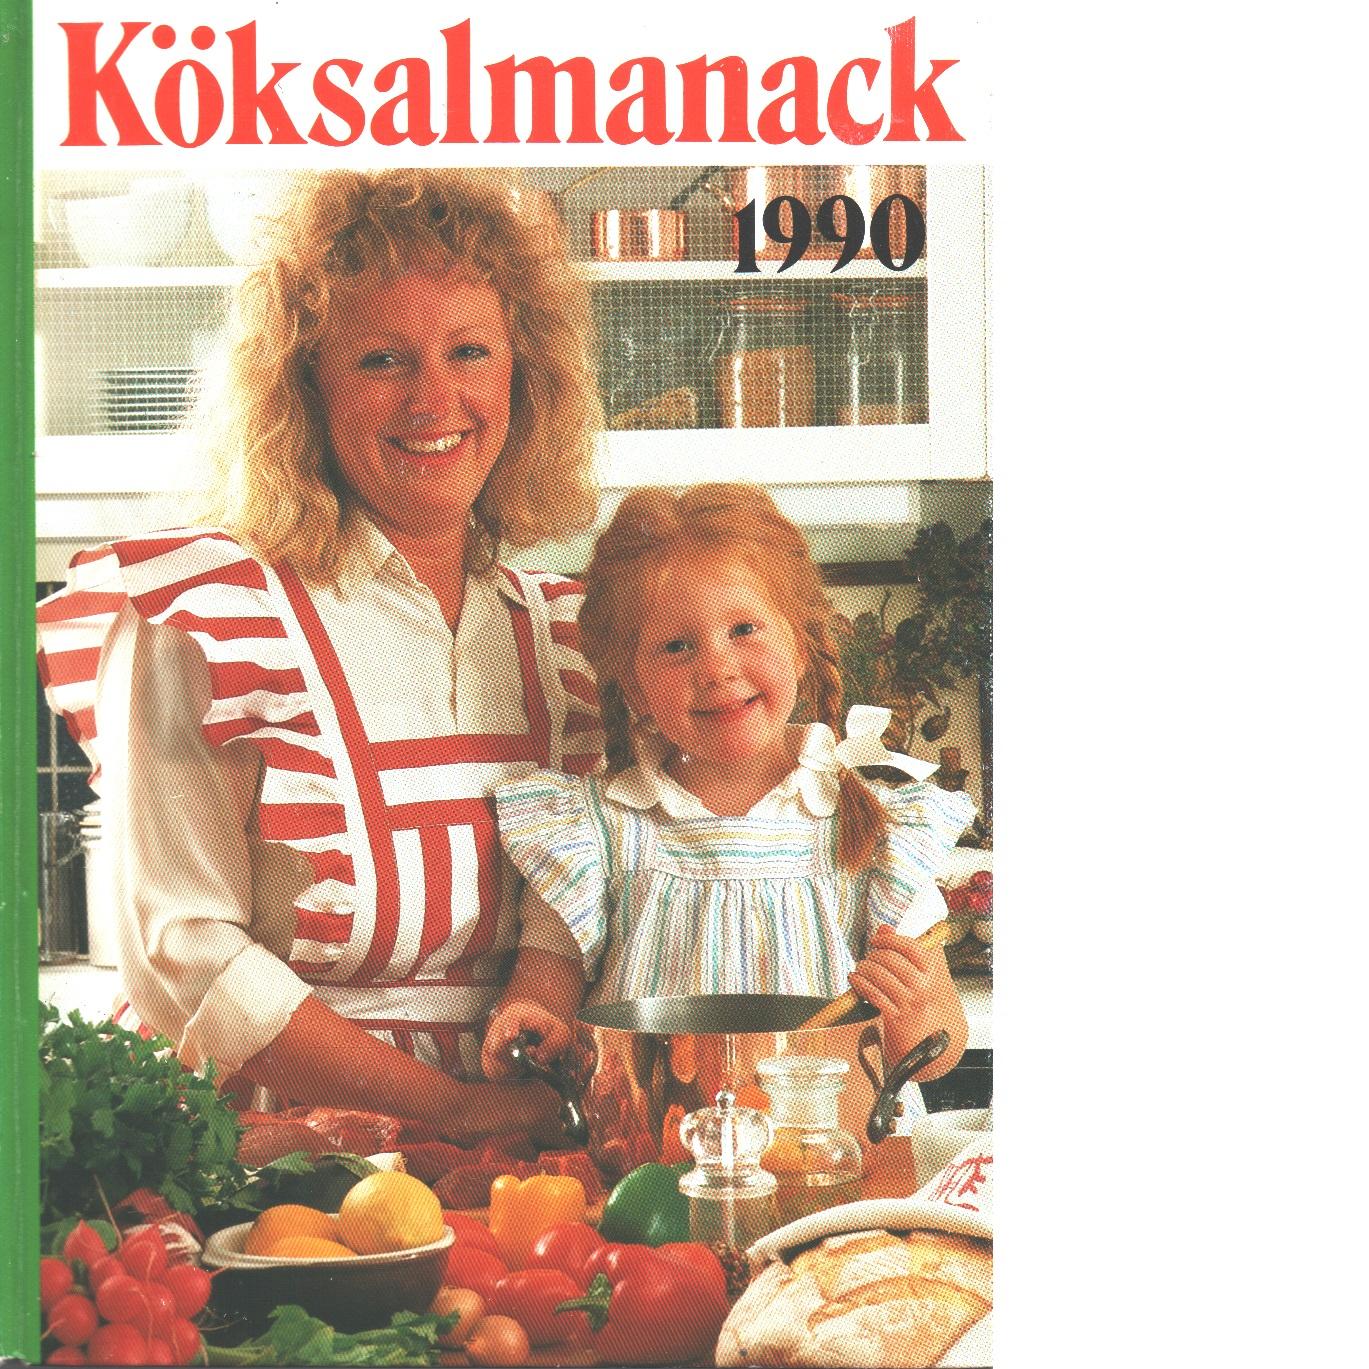 Köksalmanack 1990 - Red.